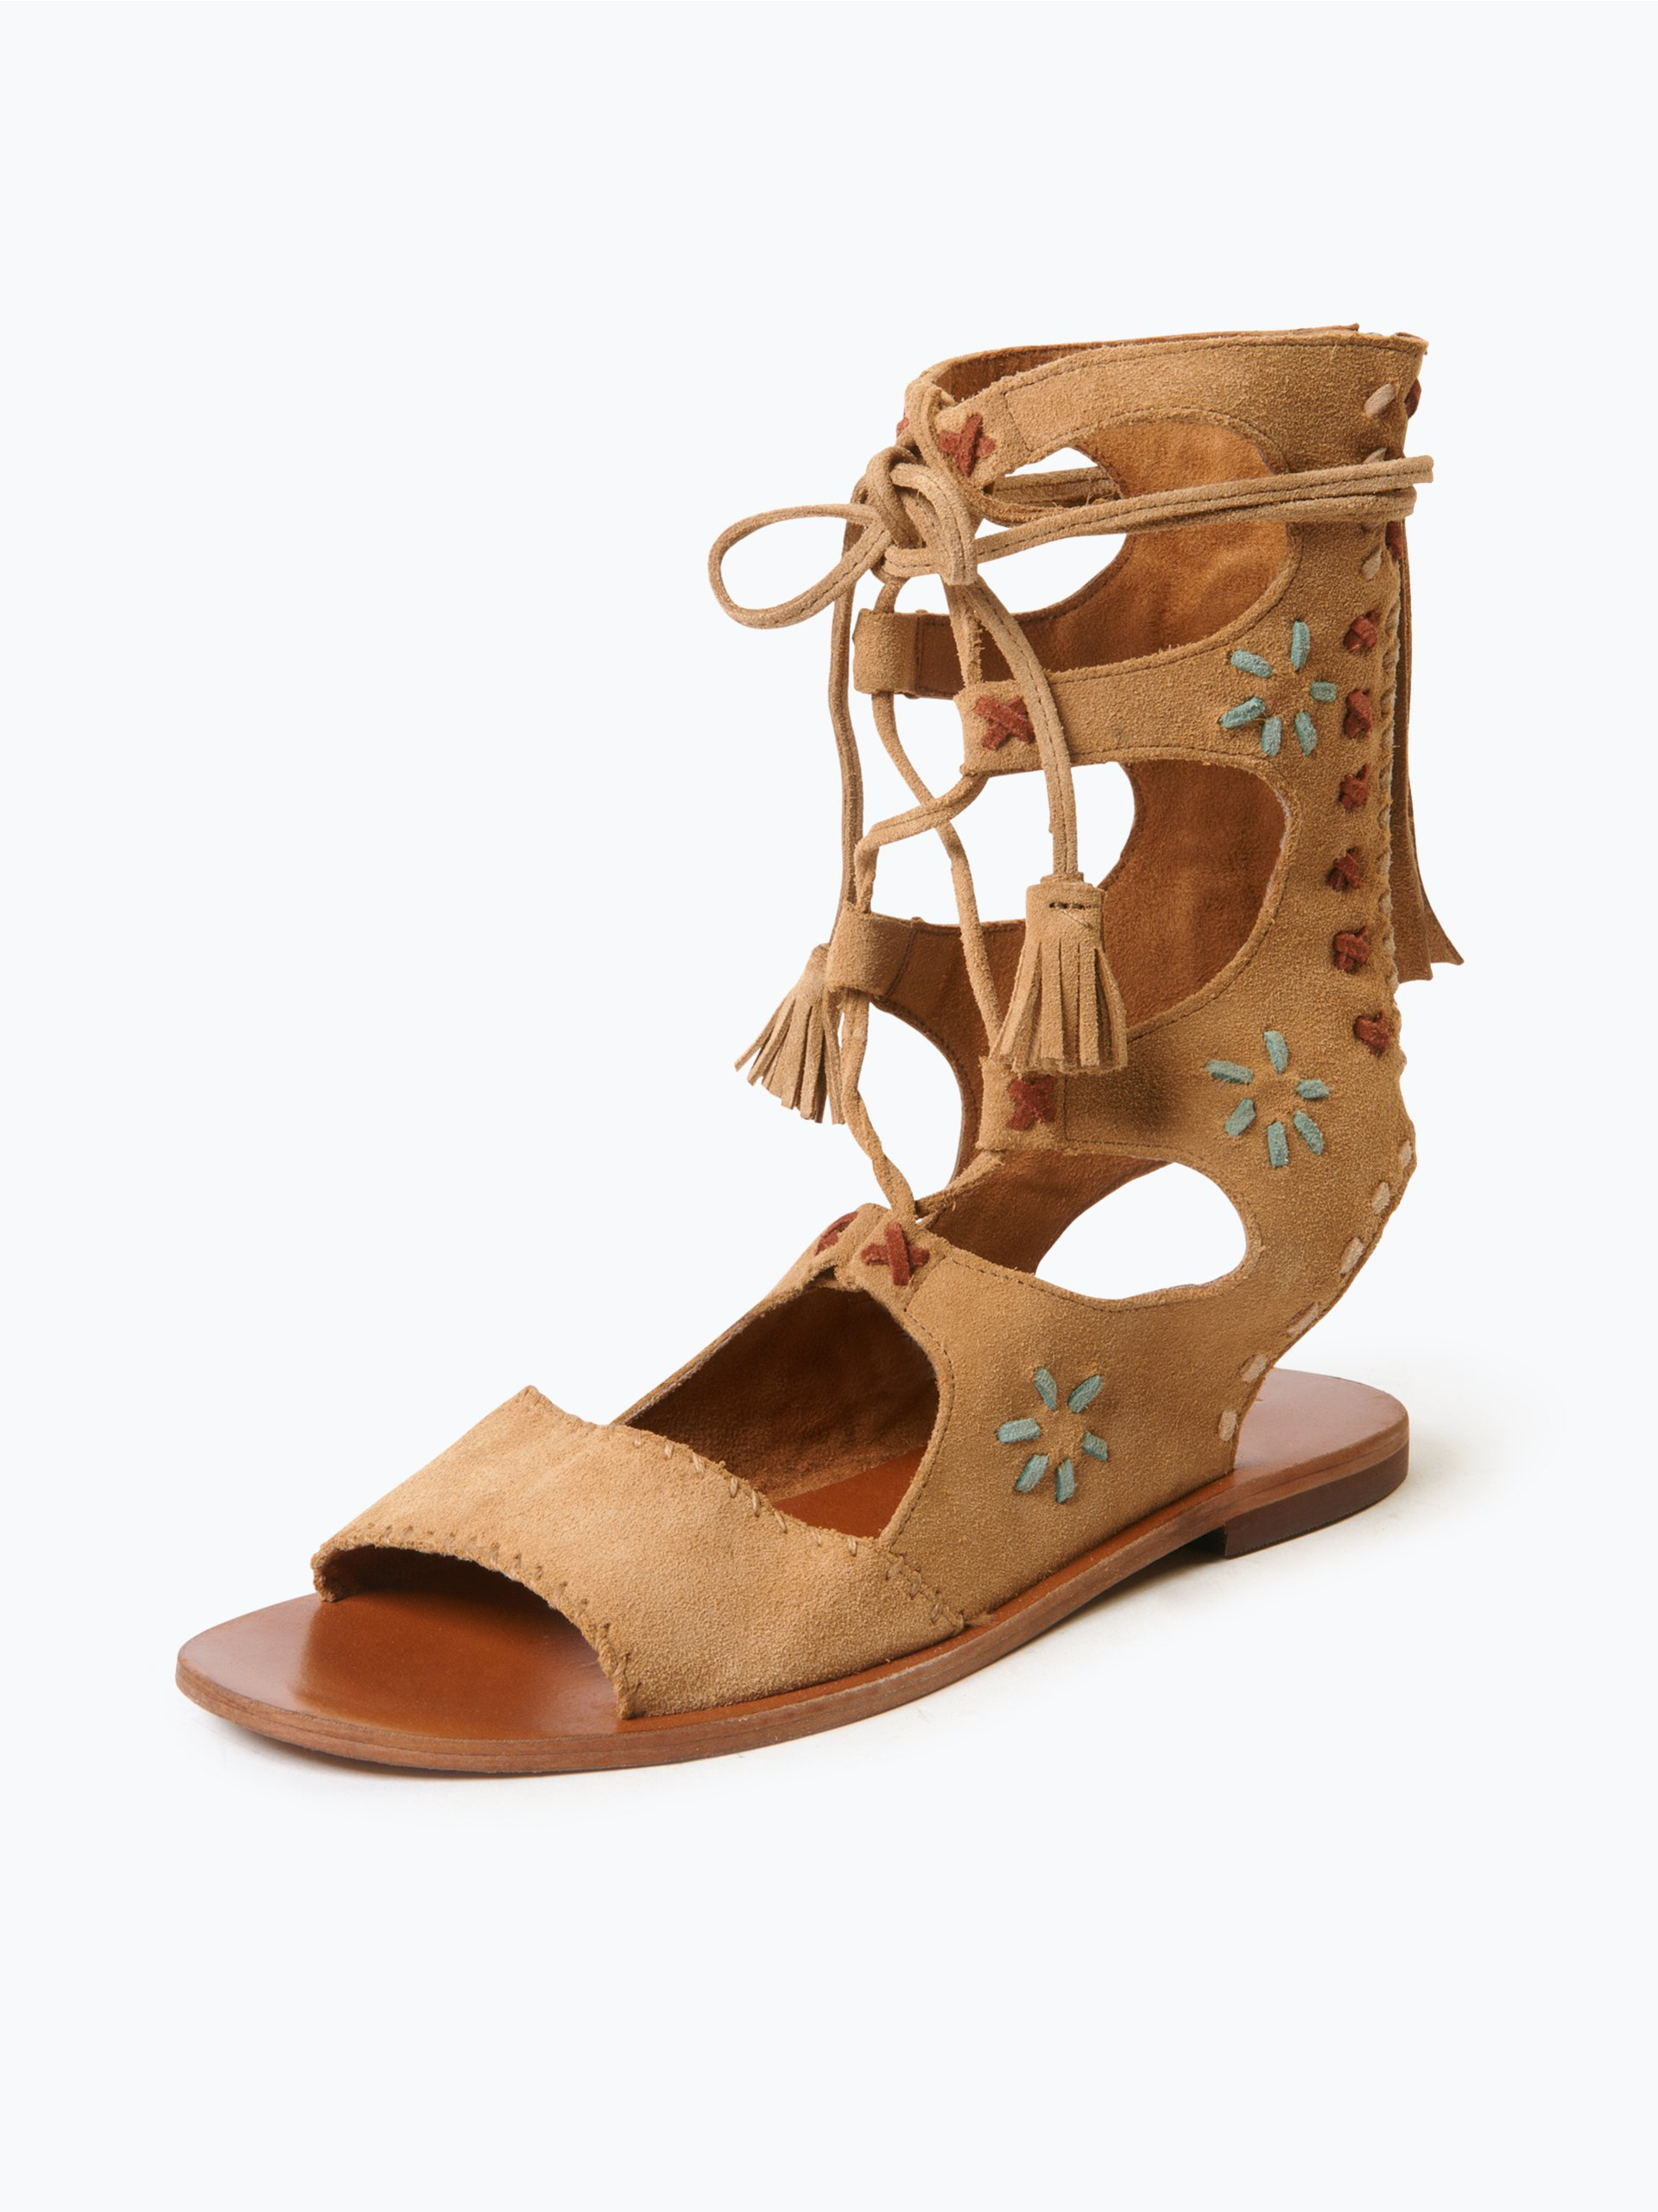 musse cloud damen sandalen aus veloursleder hanne 2 online kaufen peek und cloppenburg de. Black Bedroom Furniture Sets. Home Design Ideas